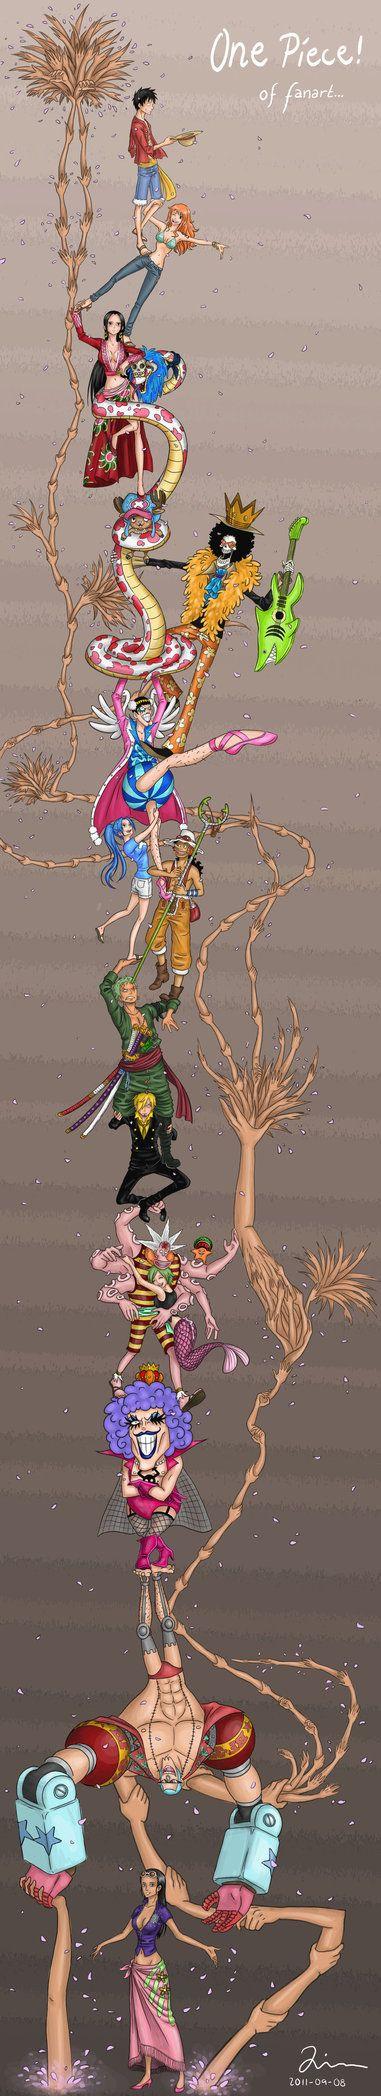 One Piece | Minimalist | Roronoa Zoro | Nami | Vinsmoke Sanji | Usopp | Monkey D Luffy | Tony Tony Chopper | Nico Robin | Franky | Brook | Boa Hancock | Ivankov | Mugiwaras | Straw Hat Crew | Equipage du Chapeau de Paille